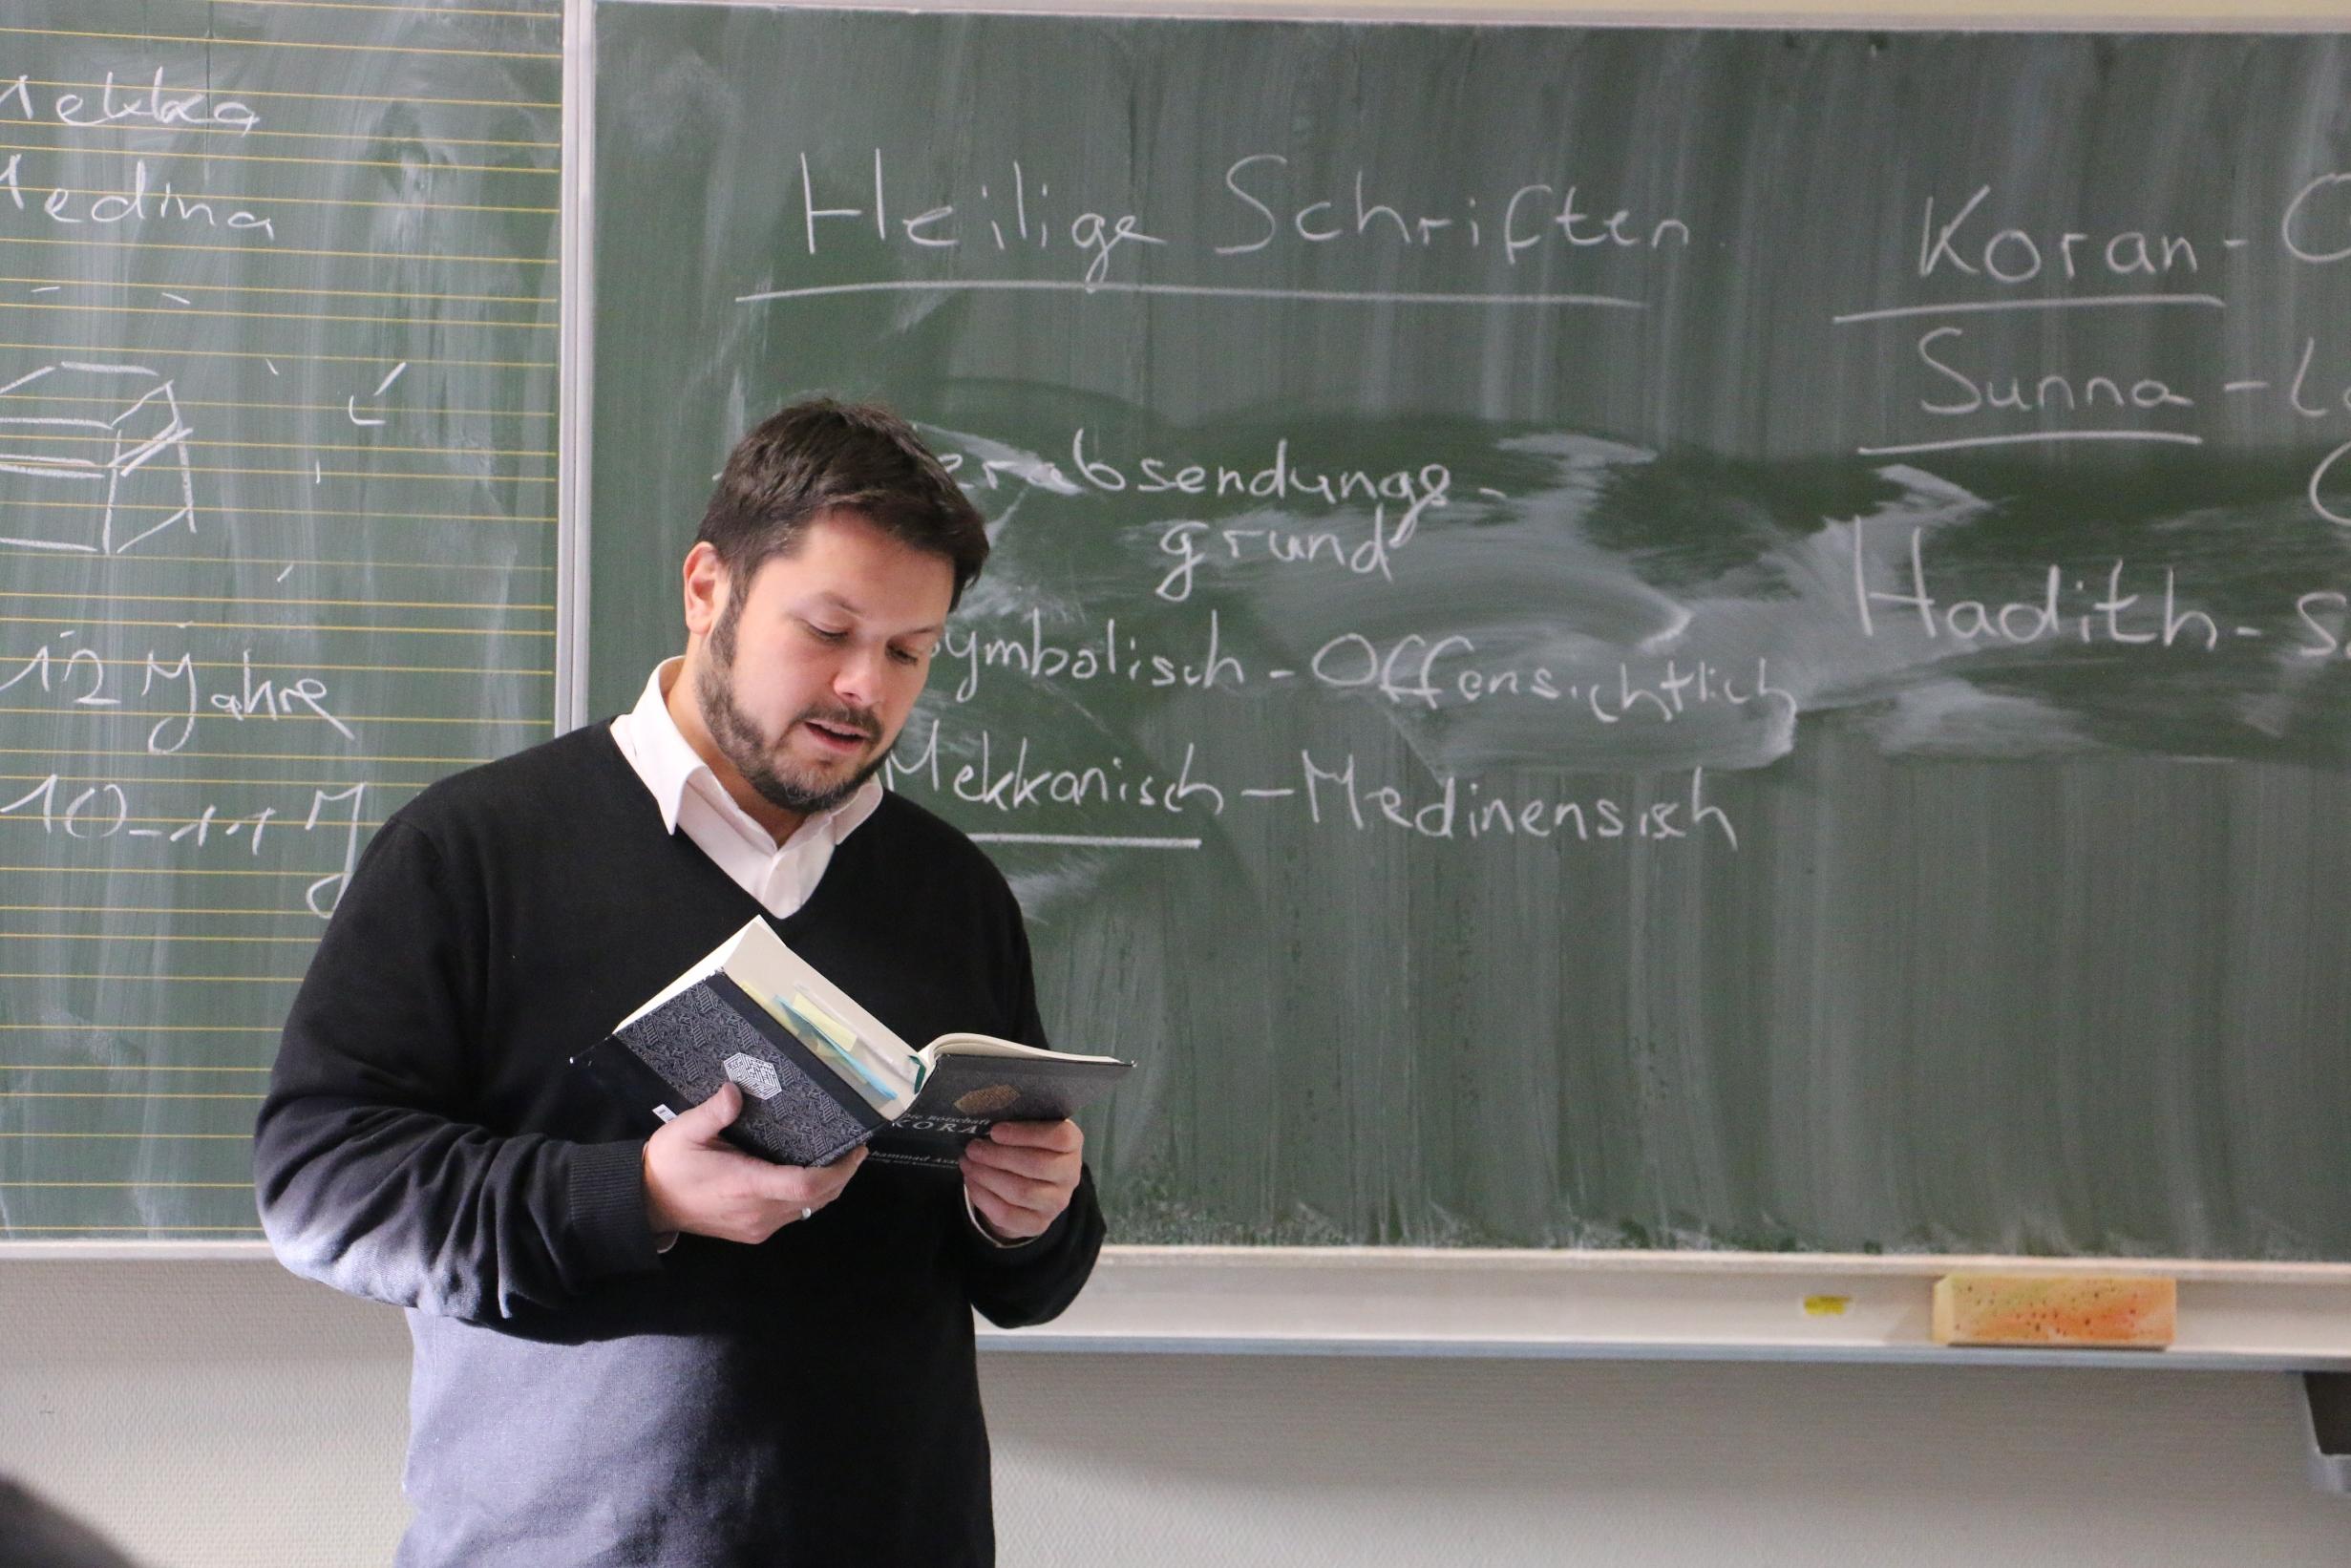 Paula-Fürst-Schule, 30.11.2015